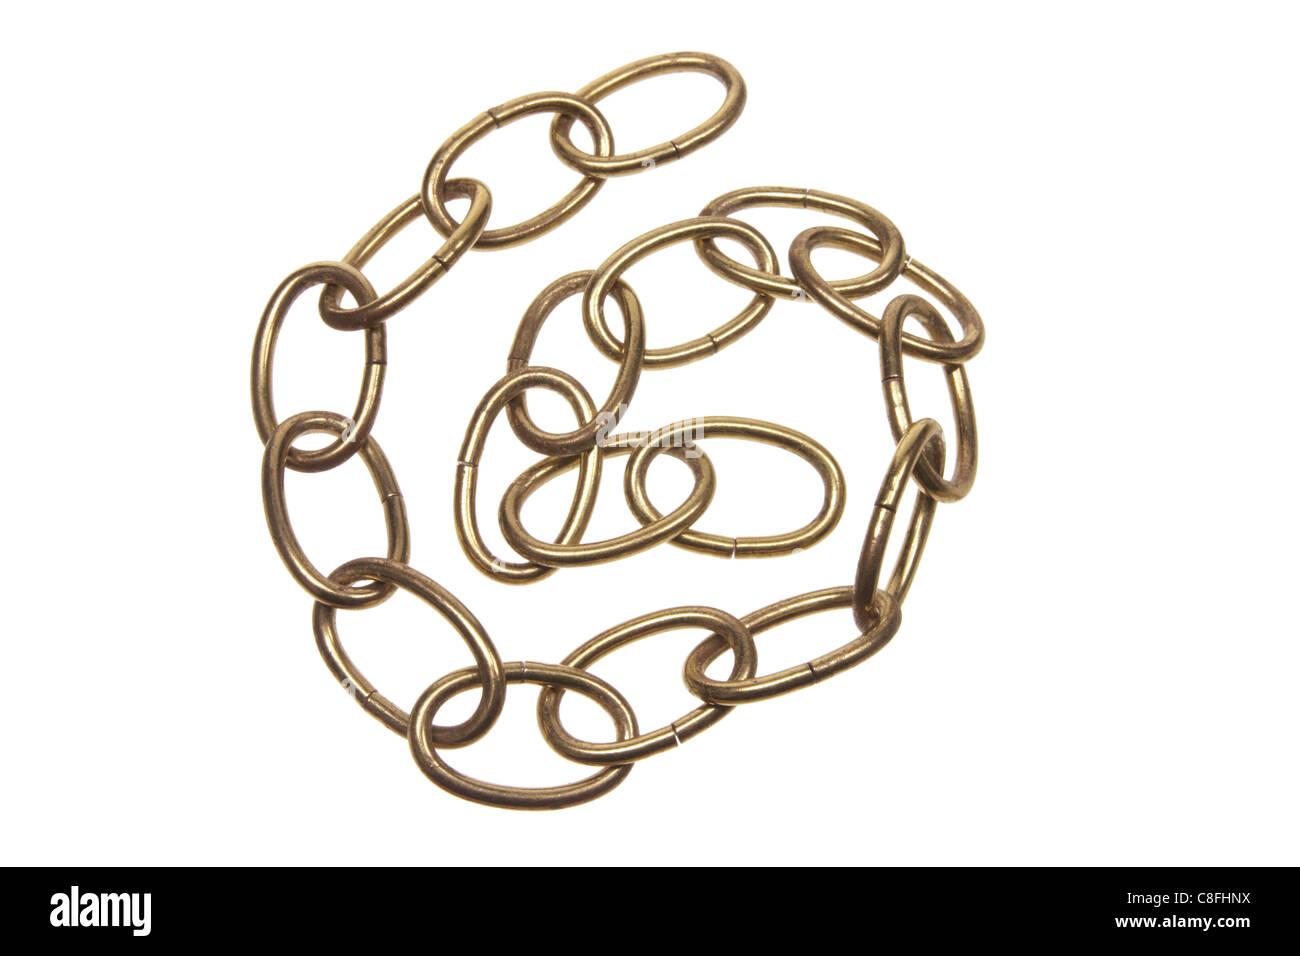 Chain - Stock Image